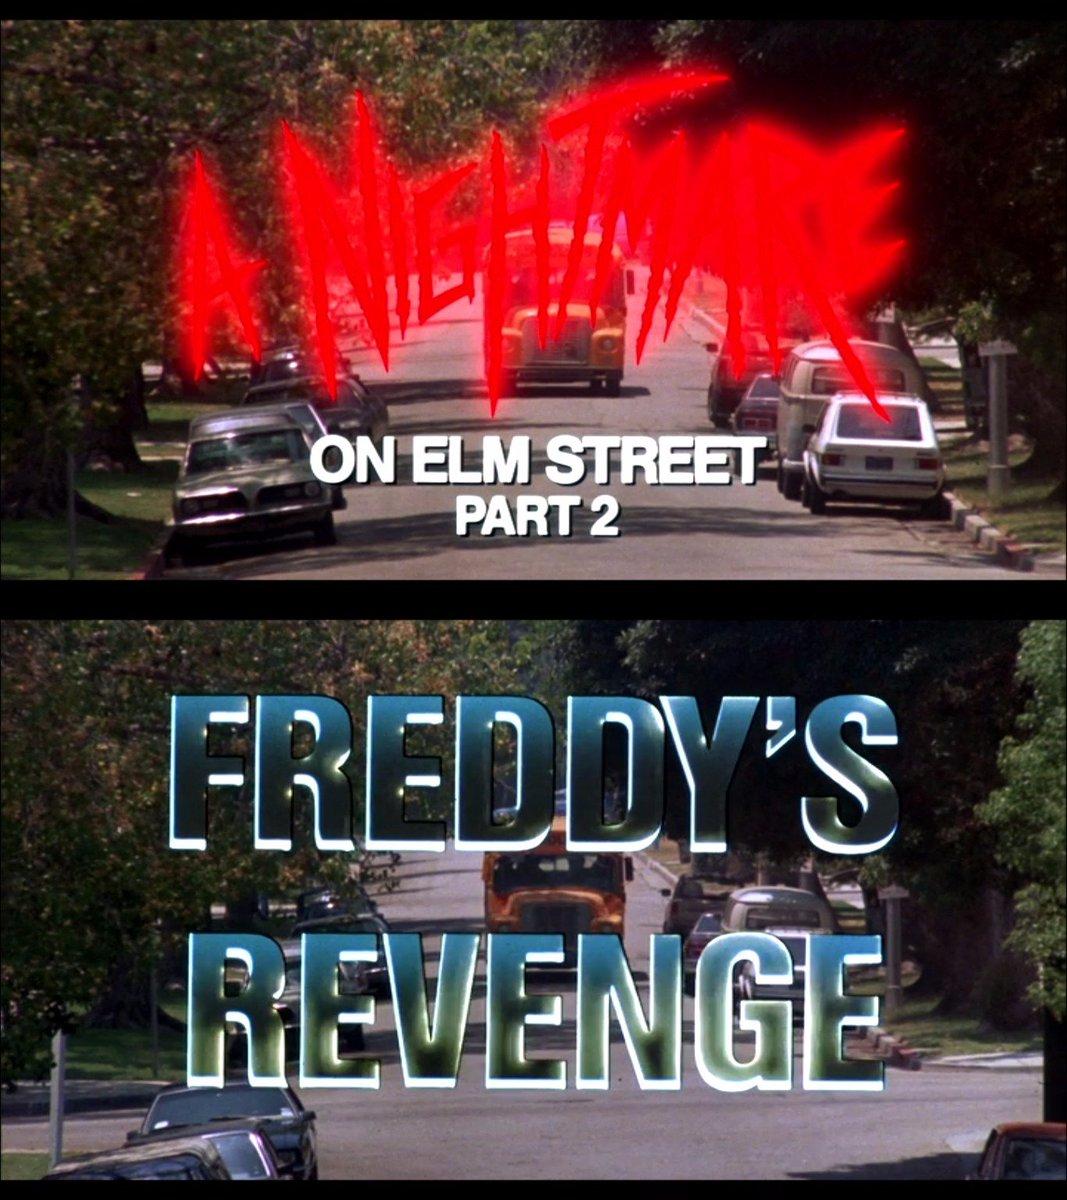 A Nightmare on Elm Street 2: Freddy&#39;s Revenge (1985) RT: 42% #freddykrueger #anightmareonelmstreet #horror #horrormovies #movietitles<br>http://pic.twitter.com/XSFjtNkOc6